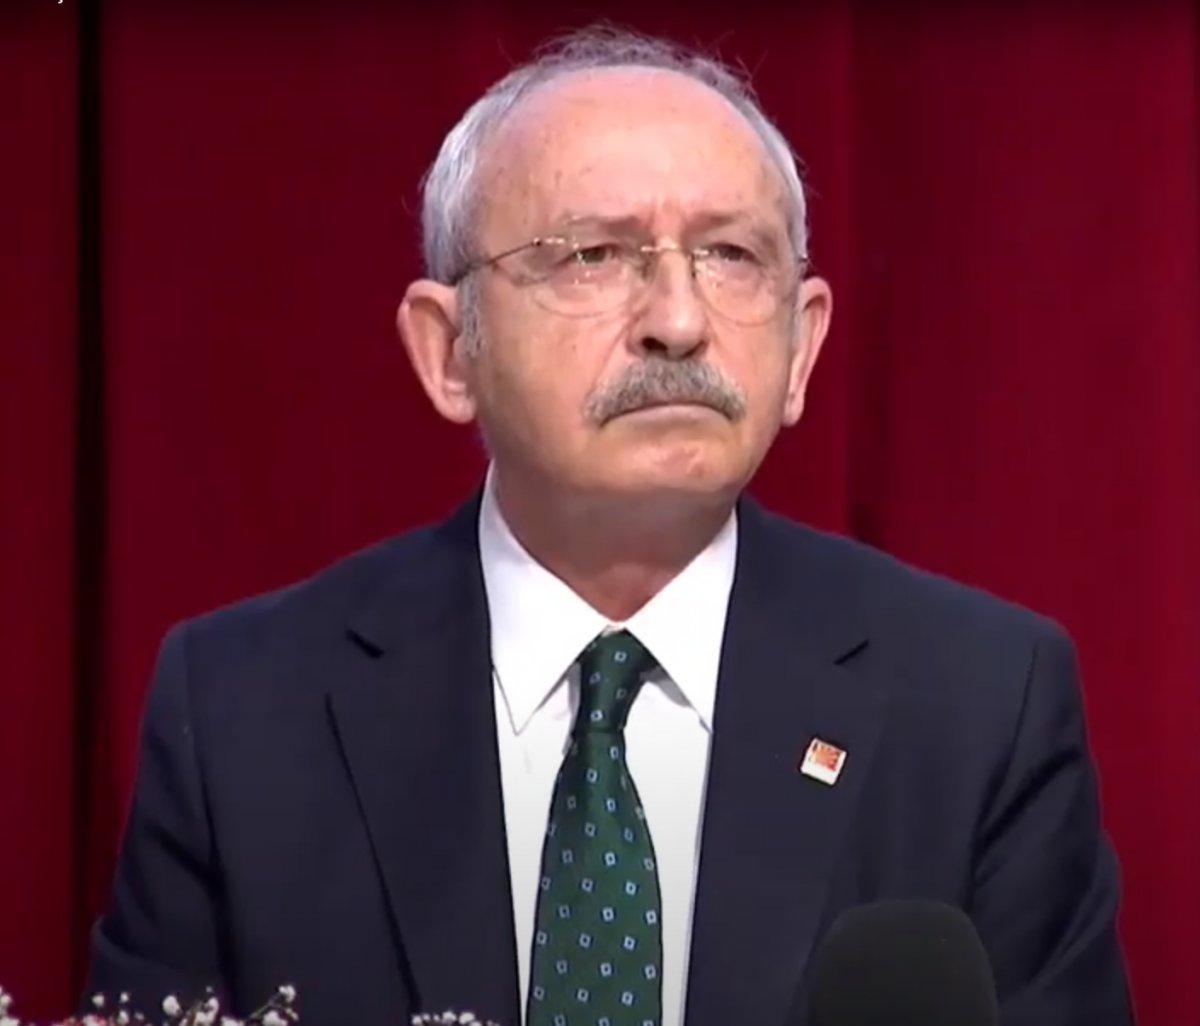 Sinoplu muhtardan Kemal Kılıçdaroğlu na HDP tepkisi #3